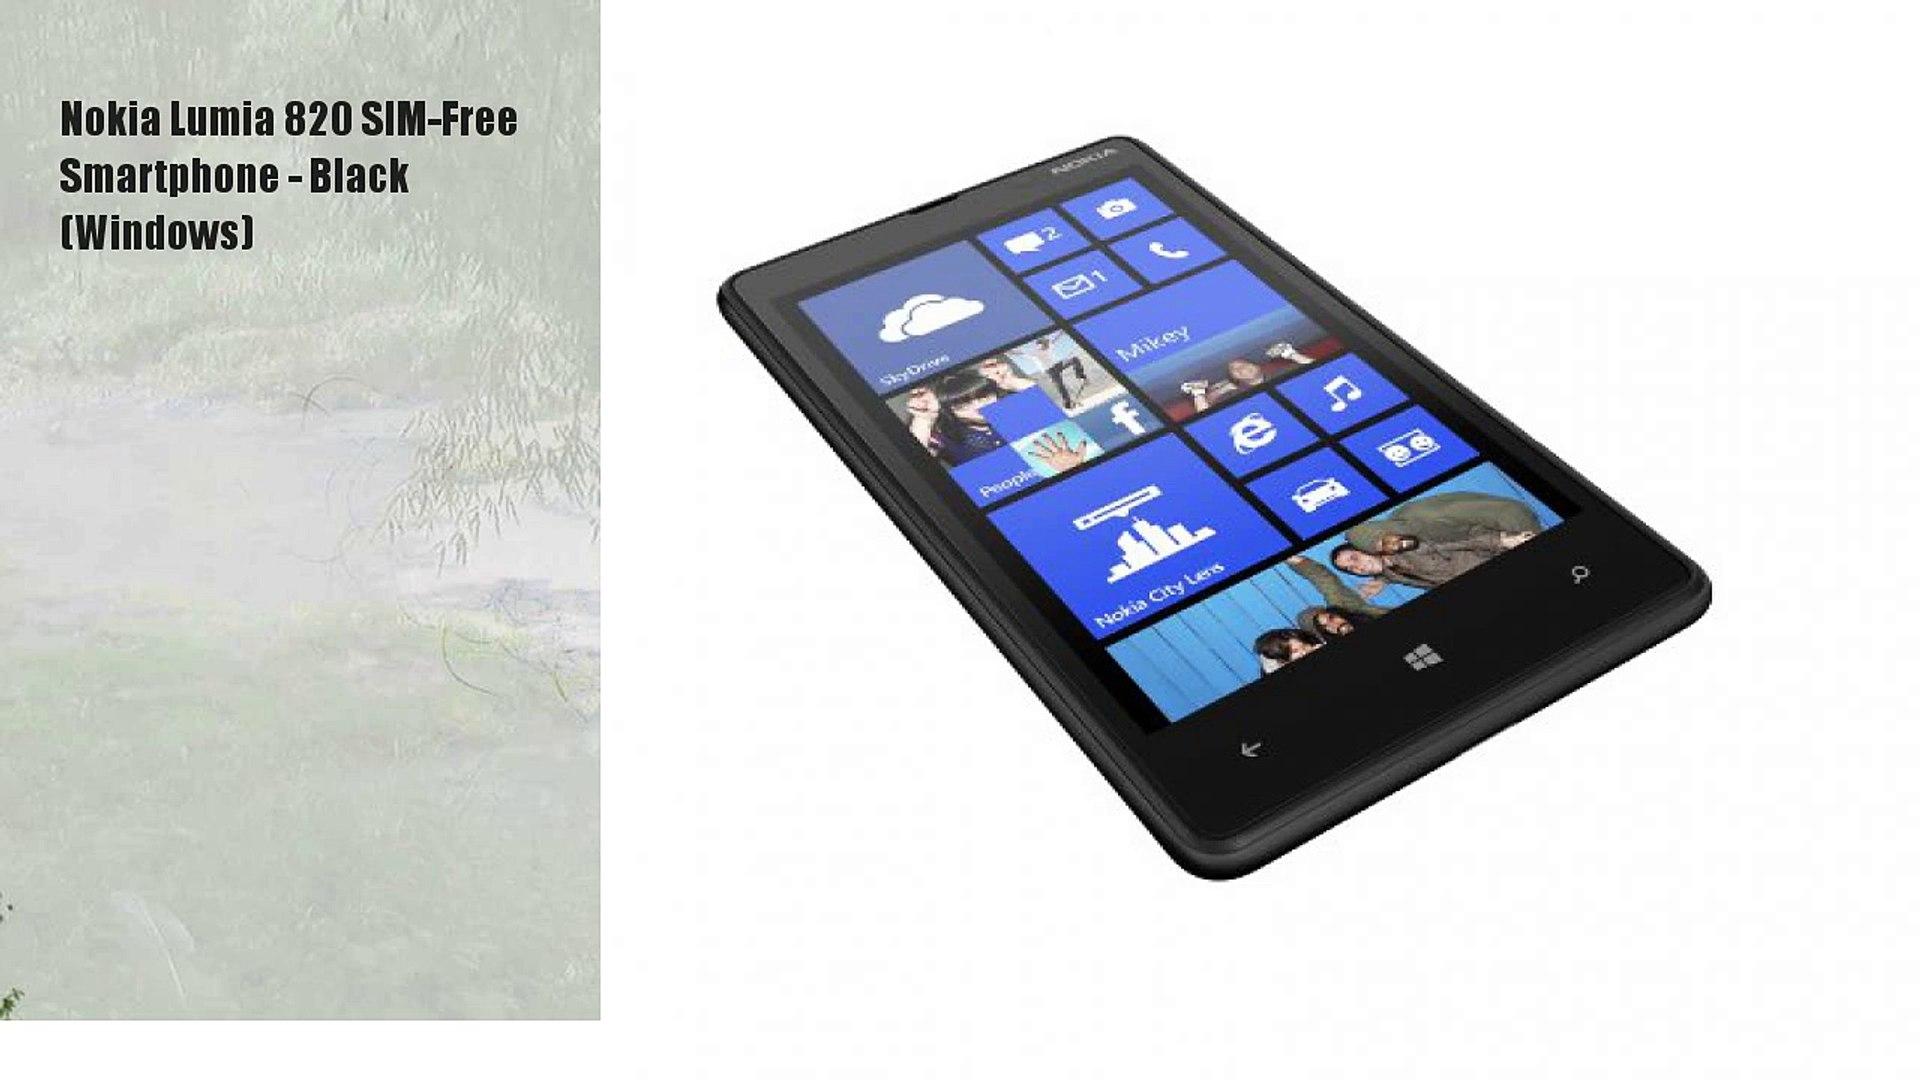 Nokia Lumia 820 SIM-Free Smartphone - Black (Windows